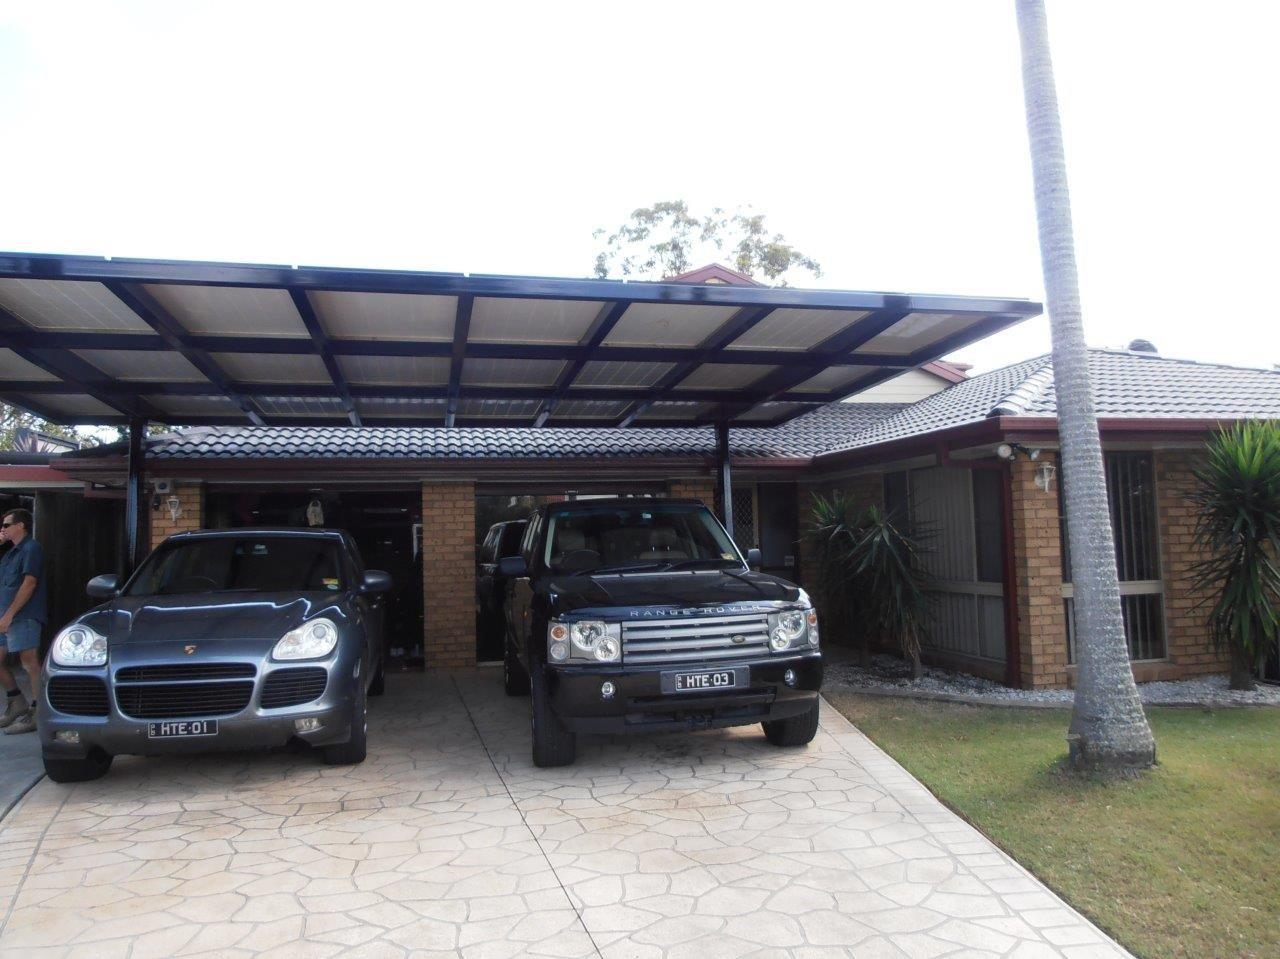 Carport Solar Panel Structure Cantilevered Steel Carport Doubles Up As A Solar Panel Structure Providing E Pergola Pergola Designs Pergola Attached To House